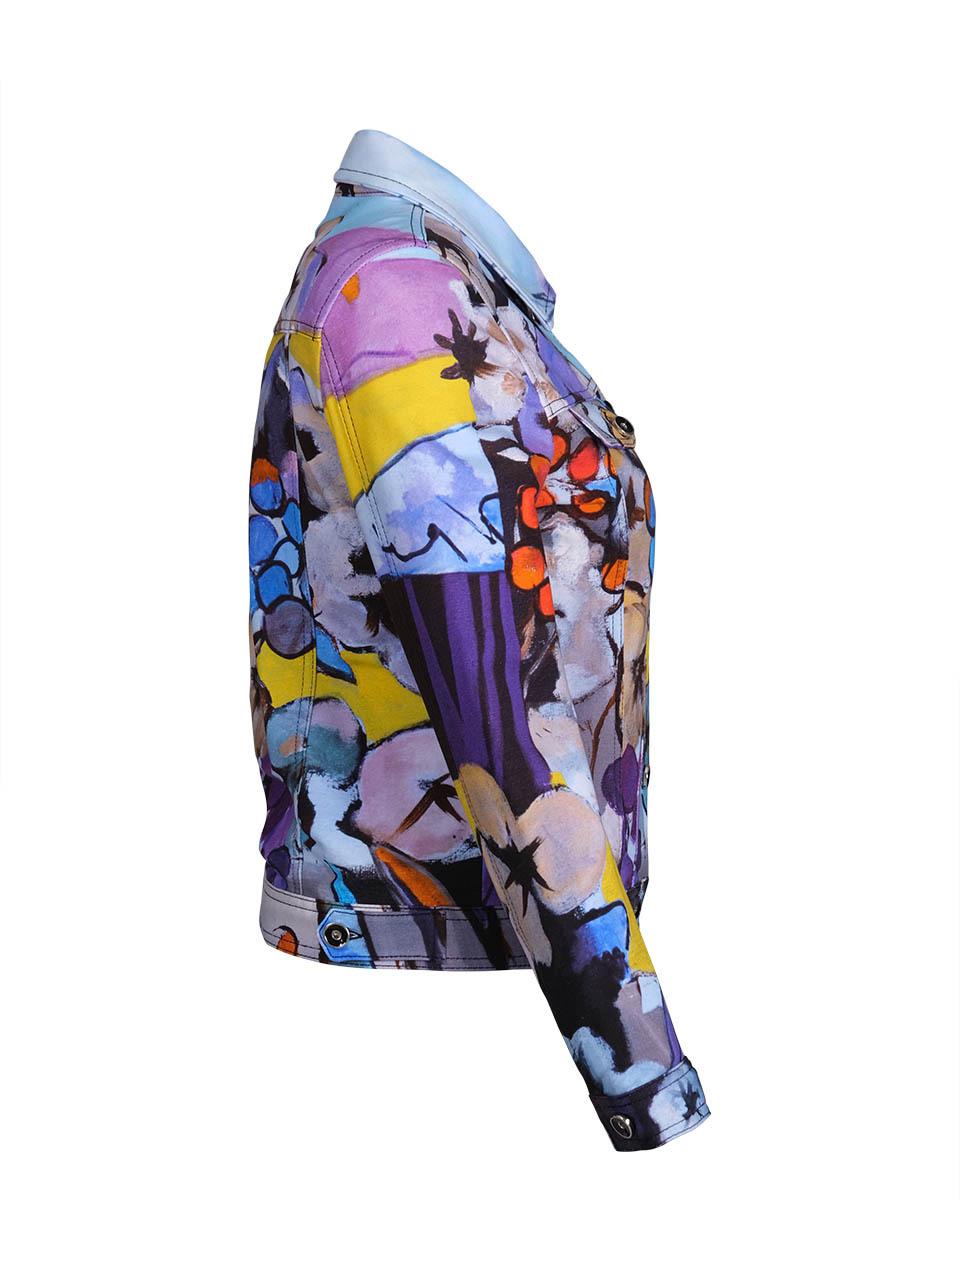 Simply Art Dolcezza: Still Life Abstract Art Soft Denim Jacket